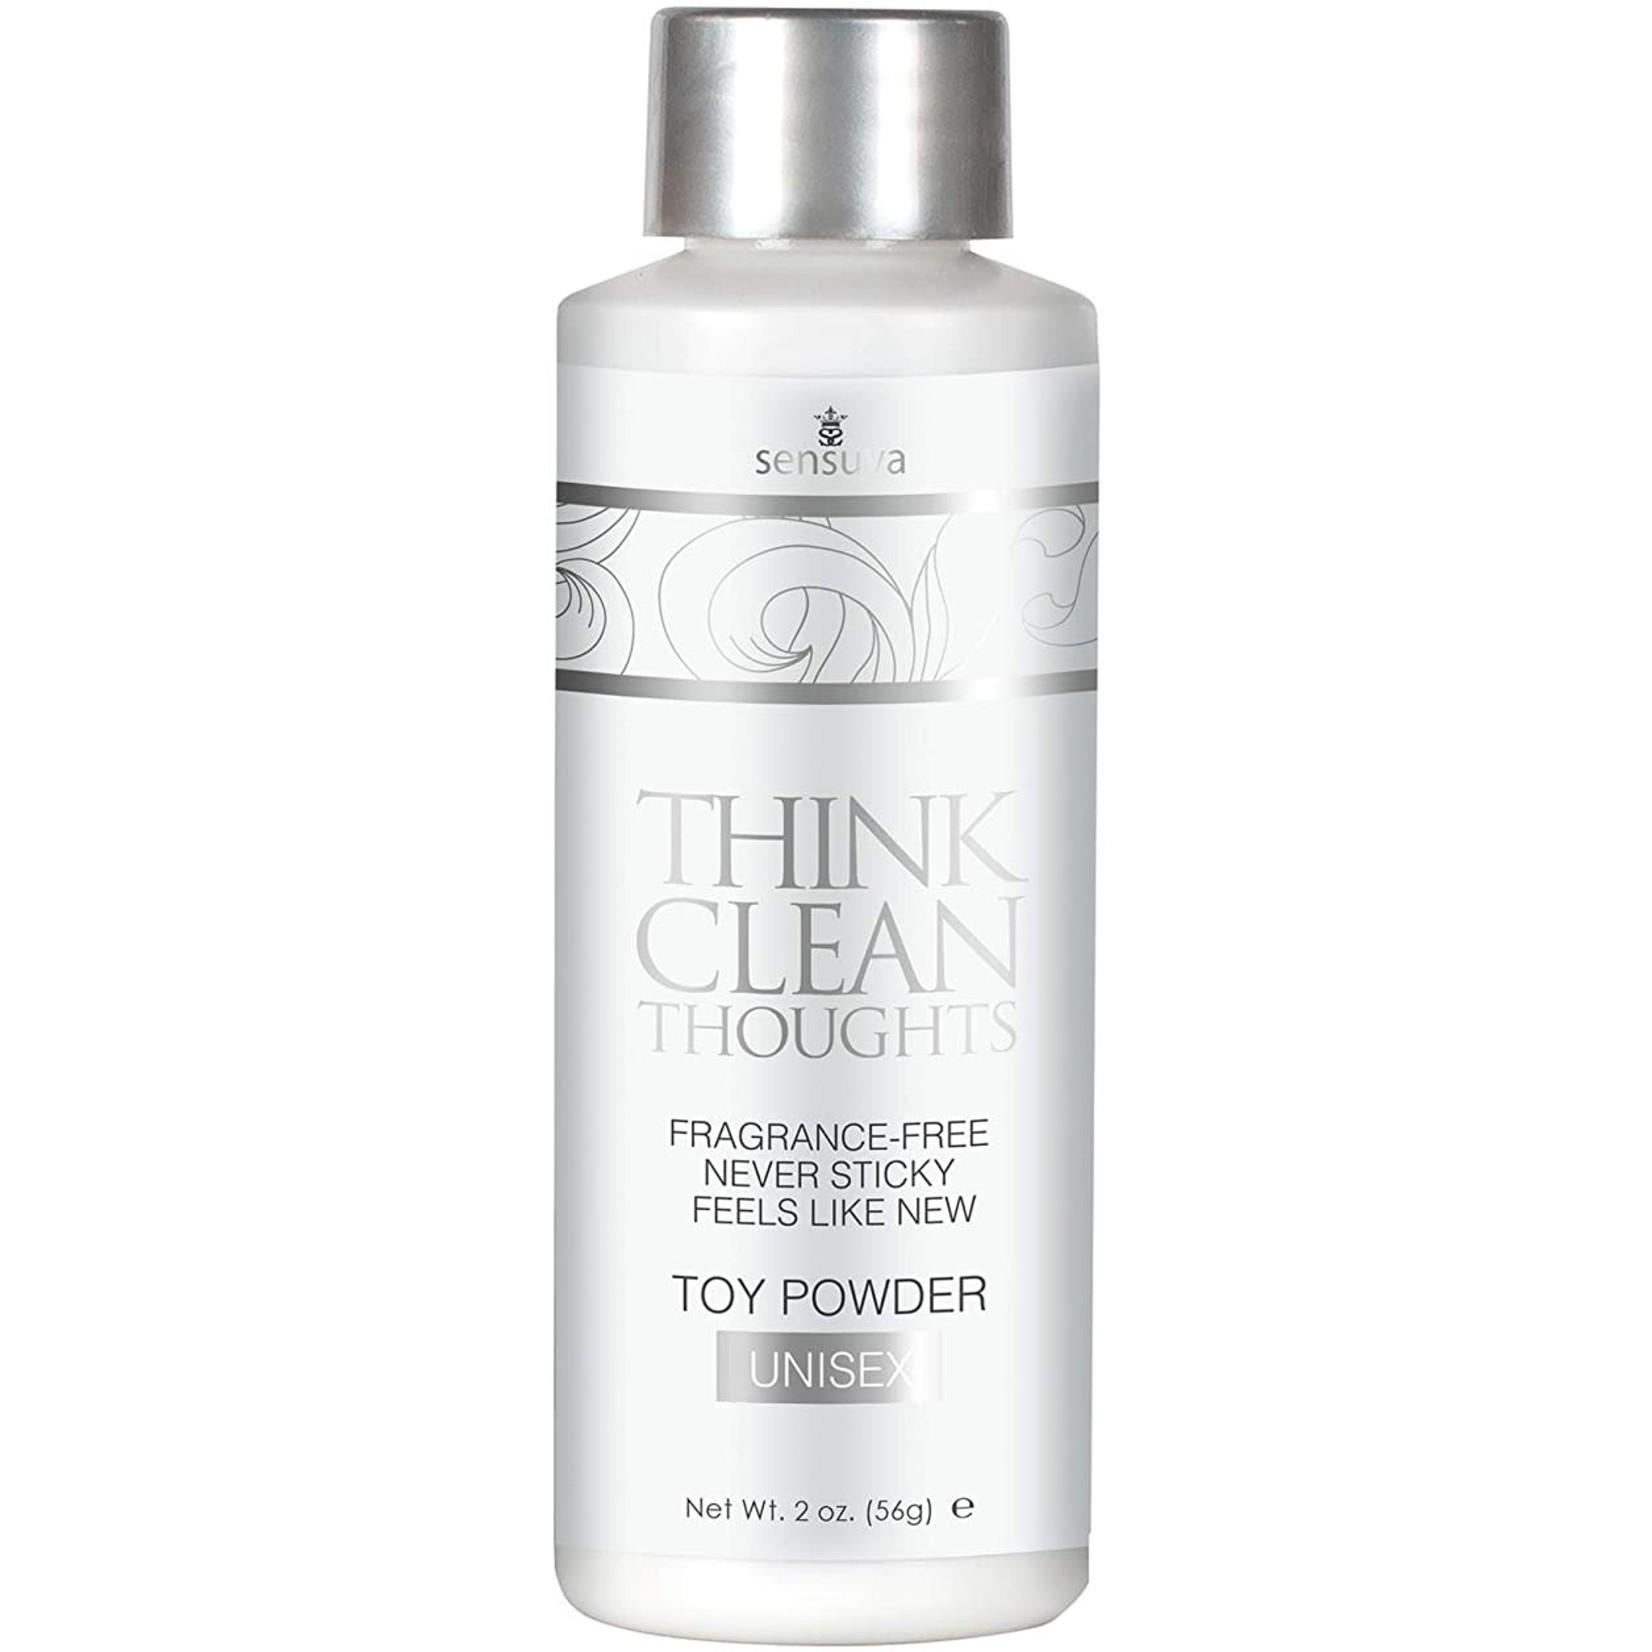 Think Clean Thoughts Toy Powder 2 fl.oz. Bottle